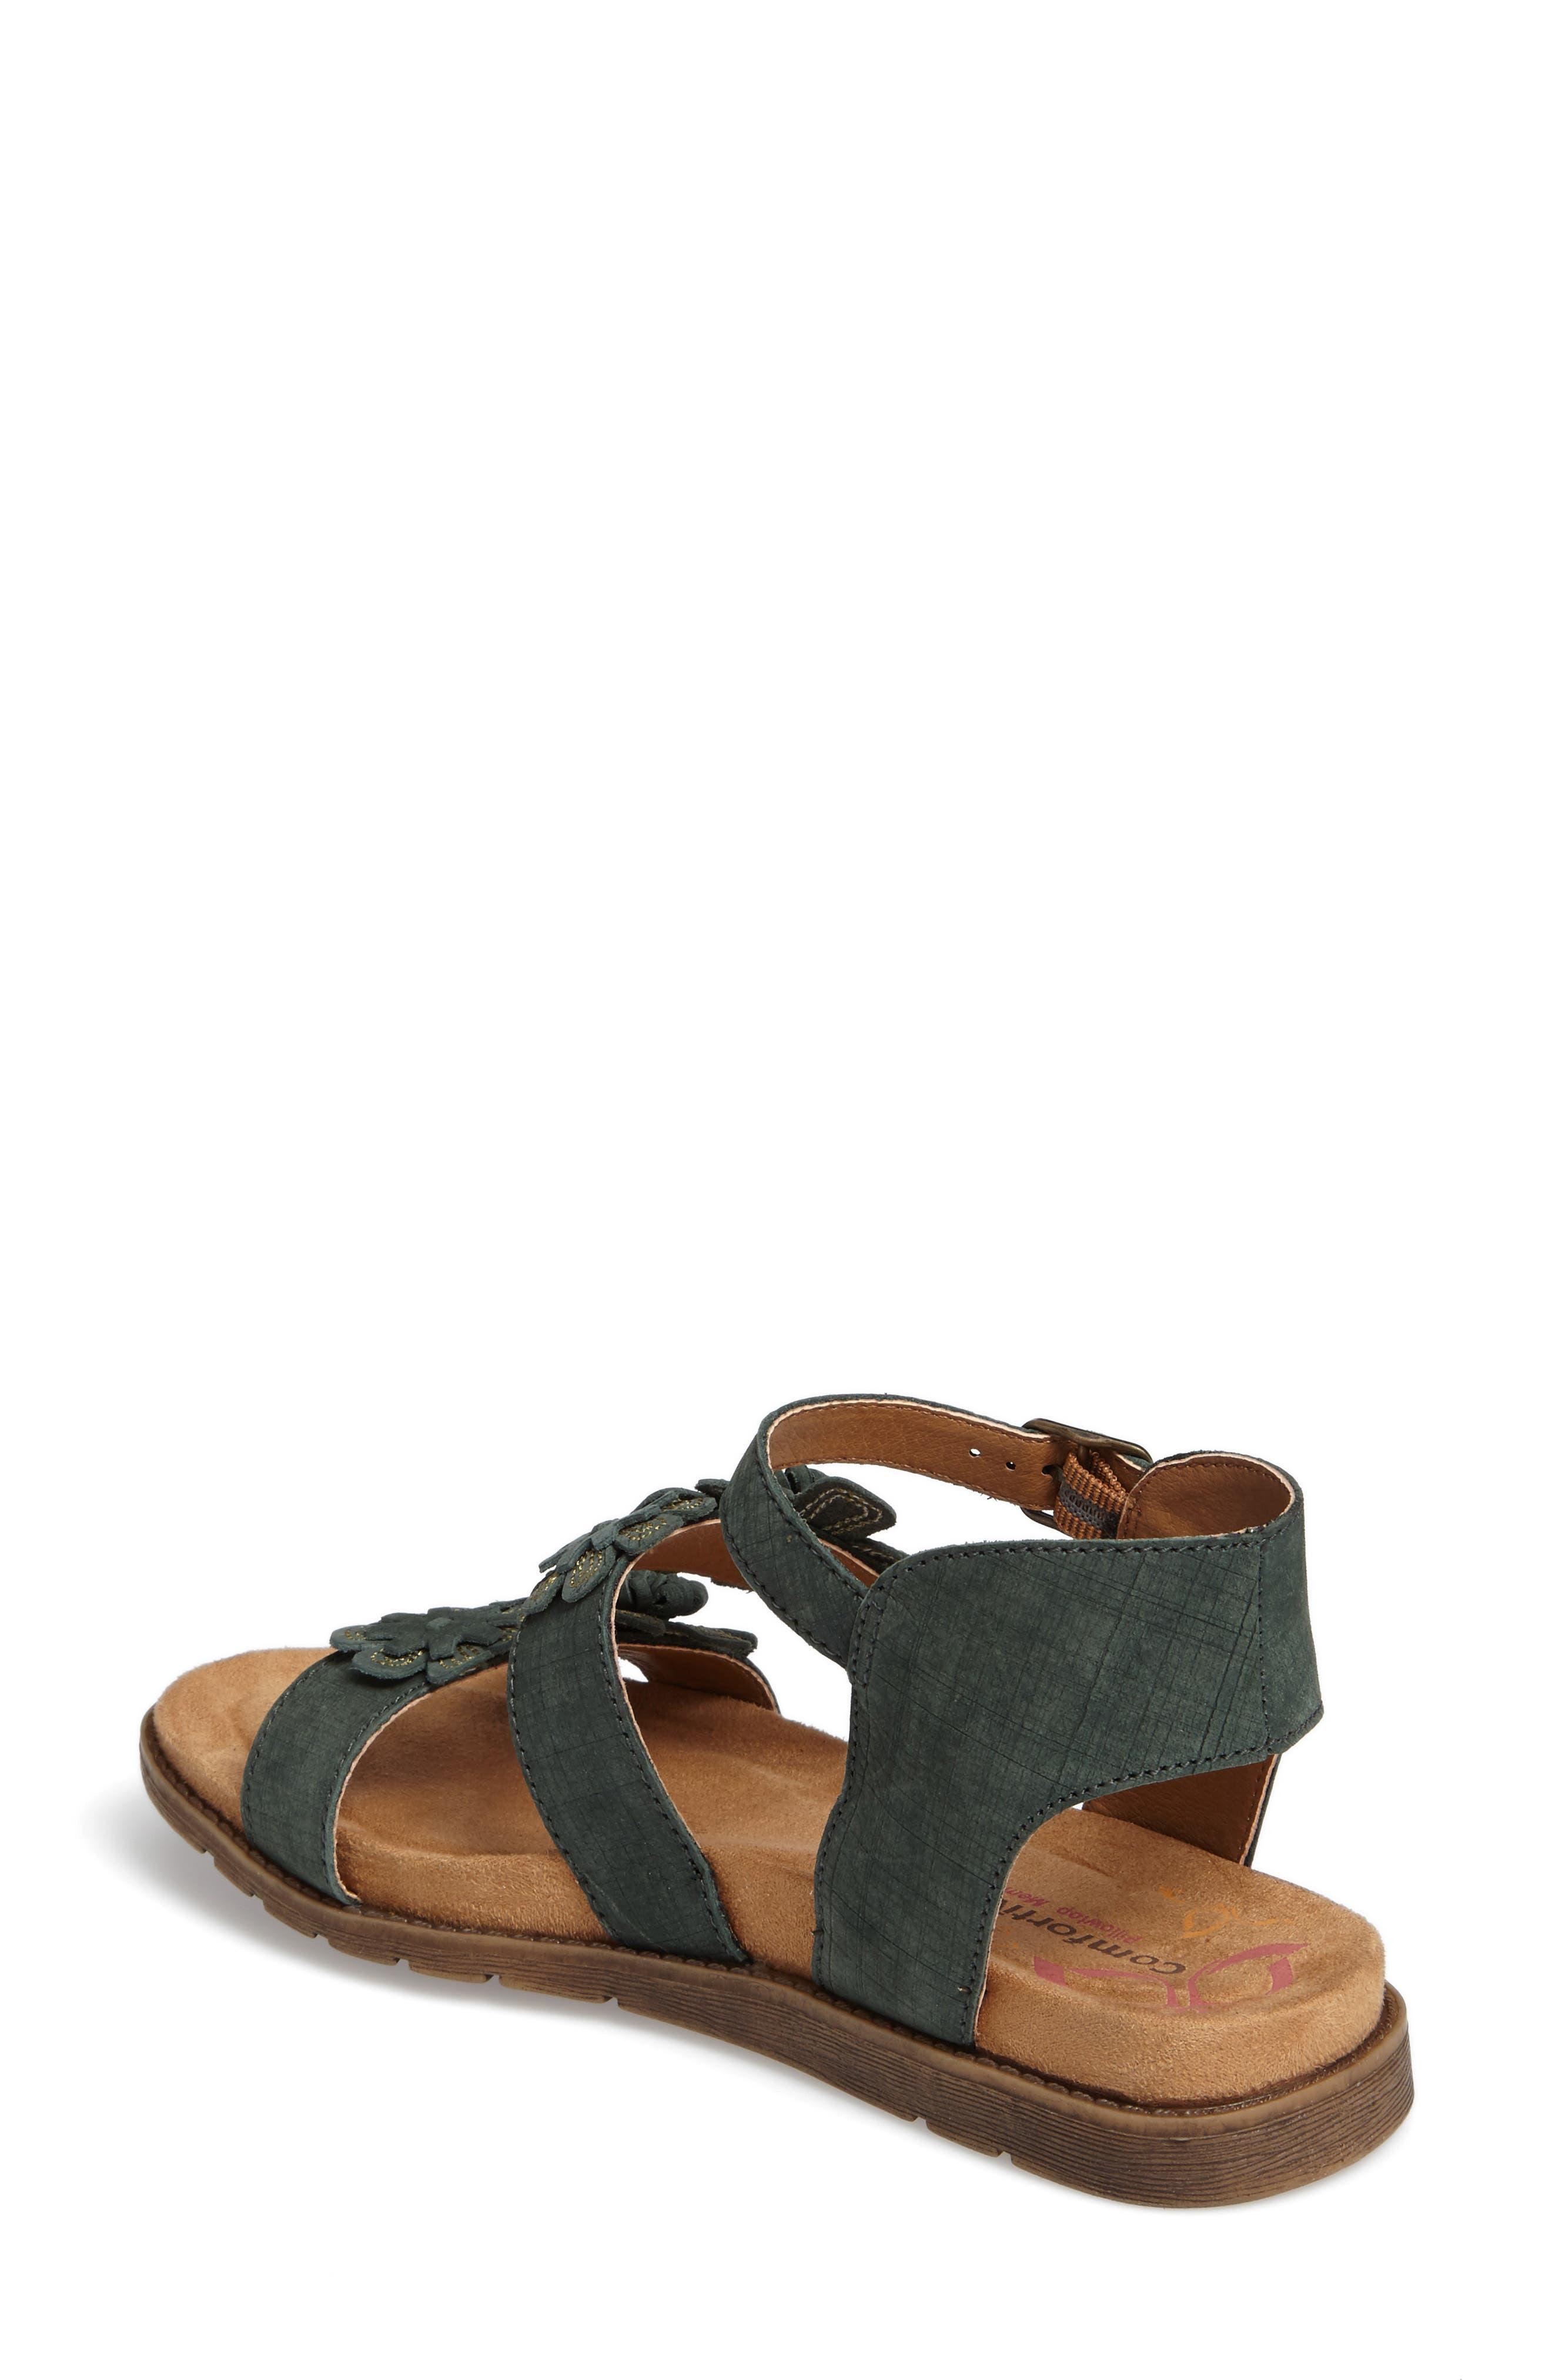 Alternate Image 2  - Comfortiva Alyssa Flower Appliqué Sandal (Women)